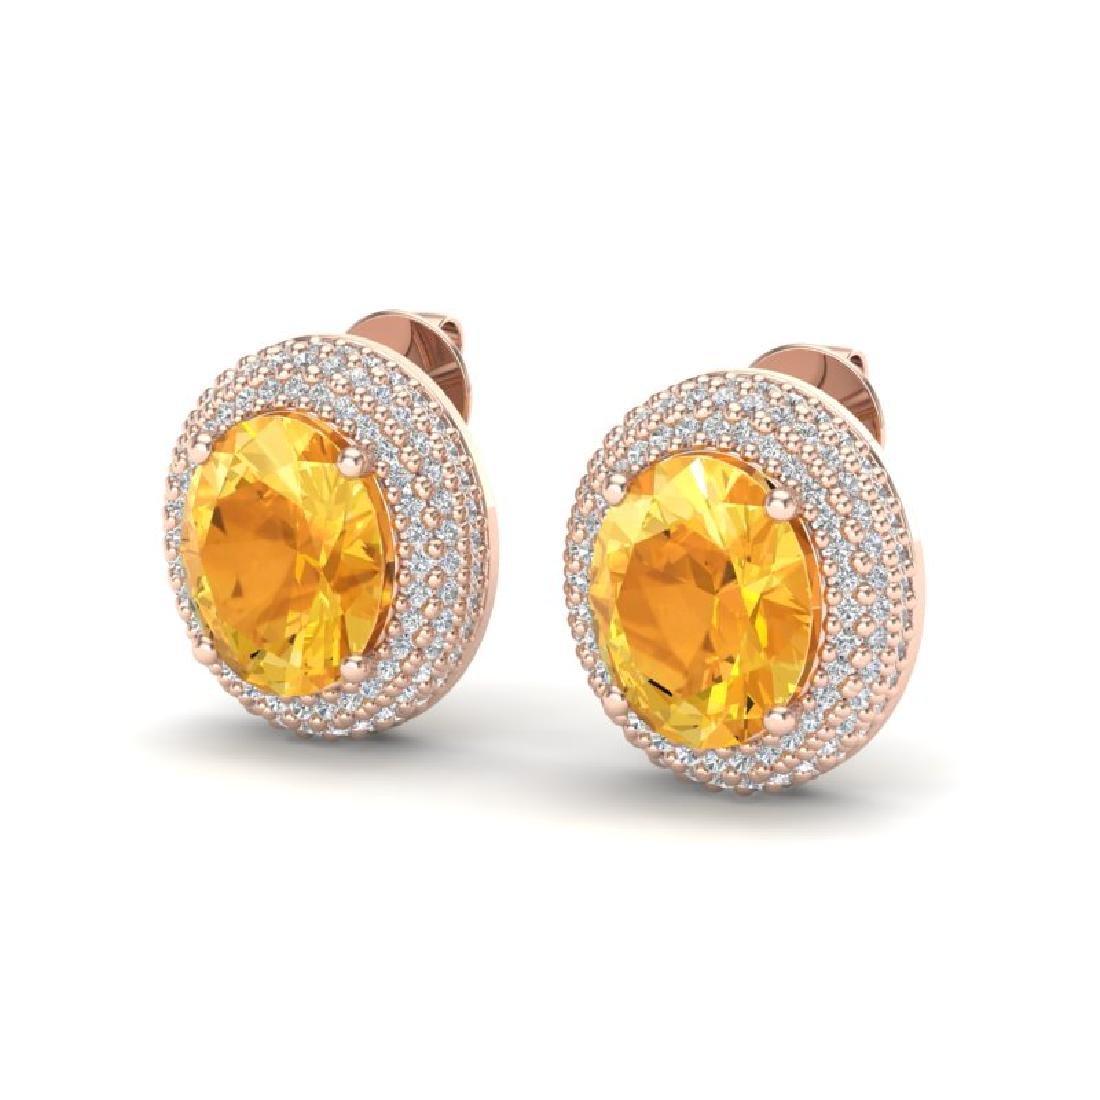 8 CTW Citrine & Micro Pave VS/SI Diamond Earrings 14K